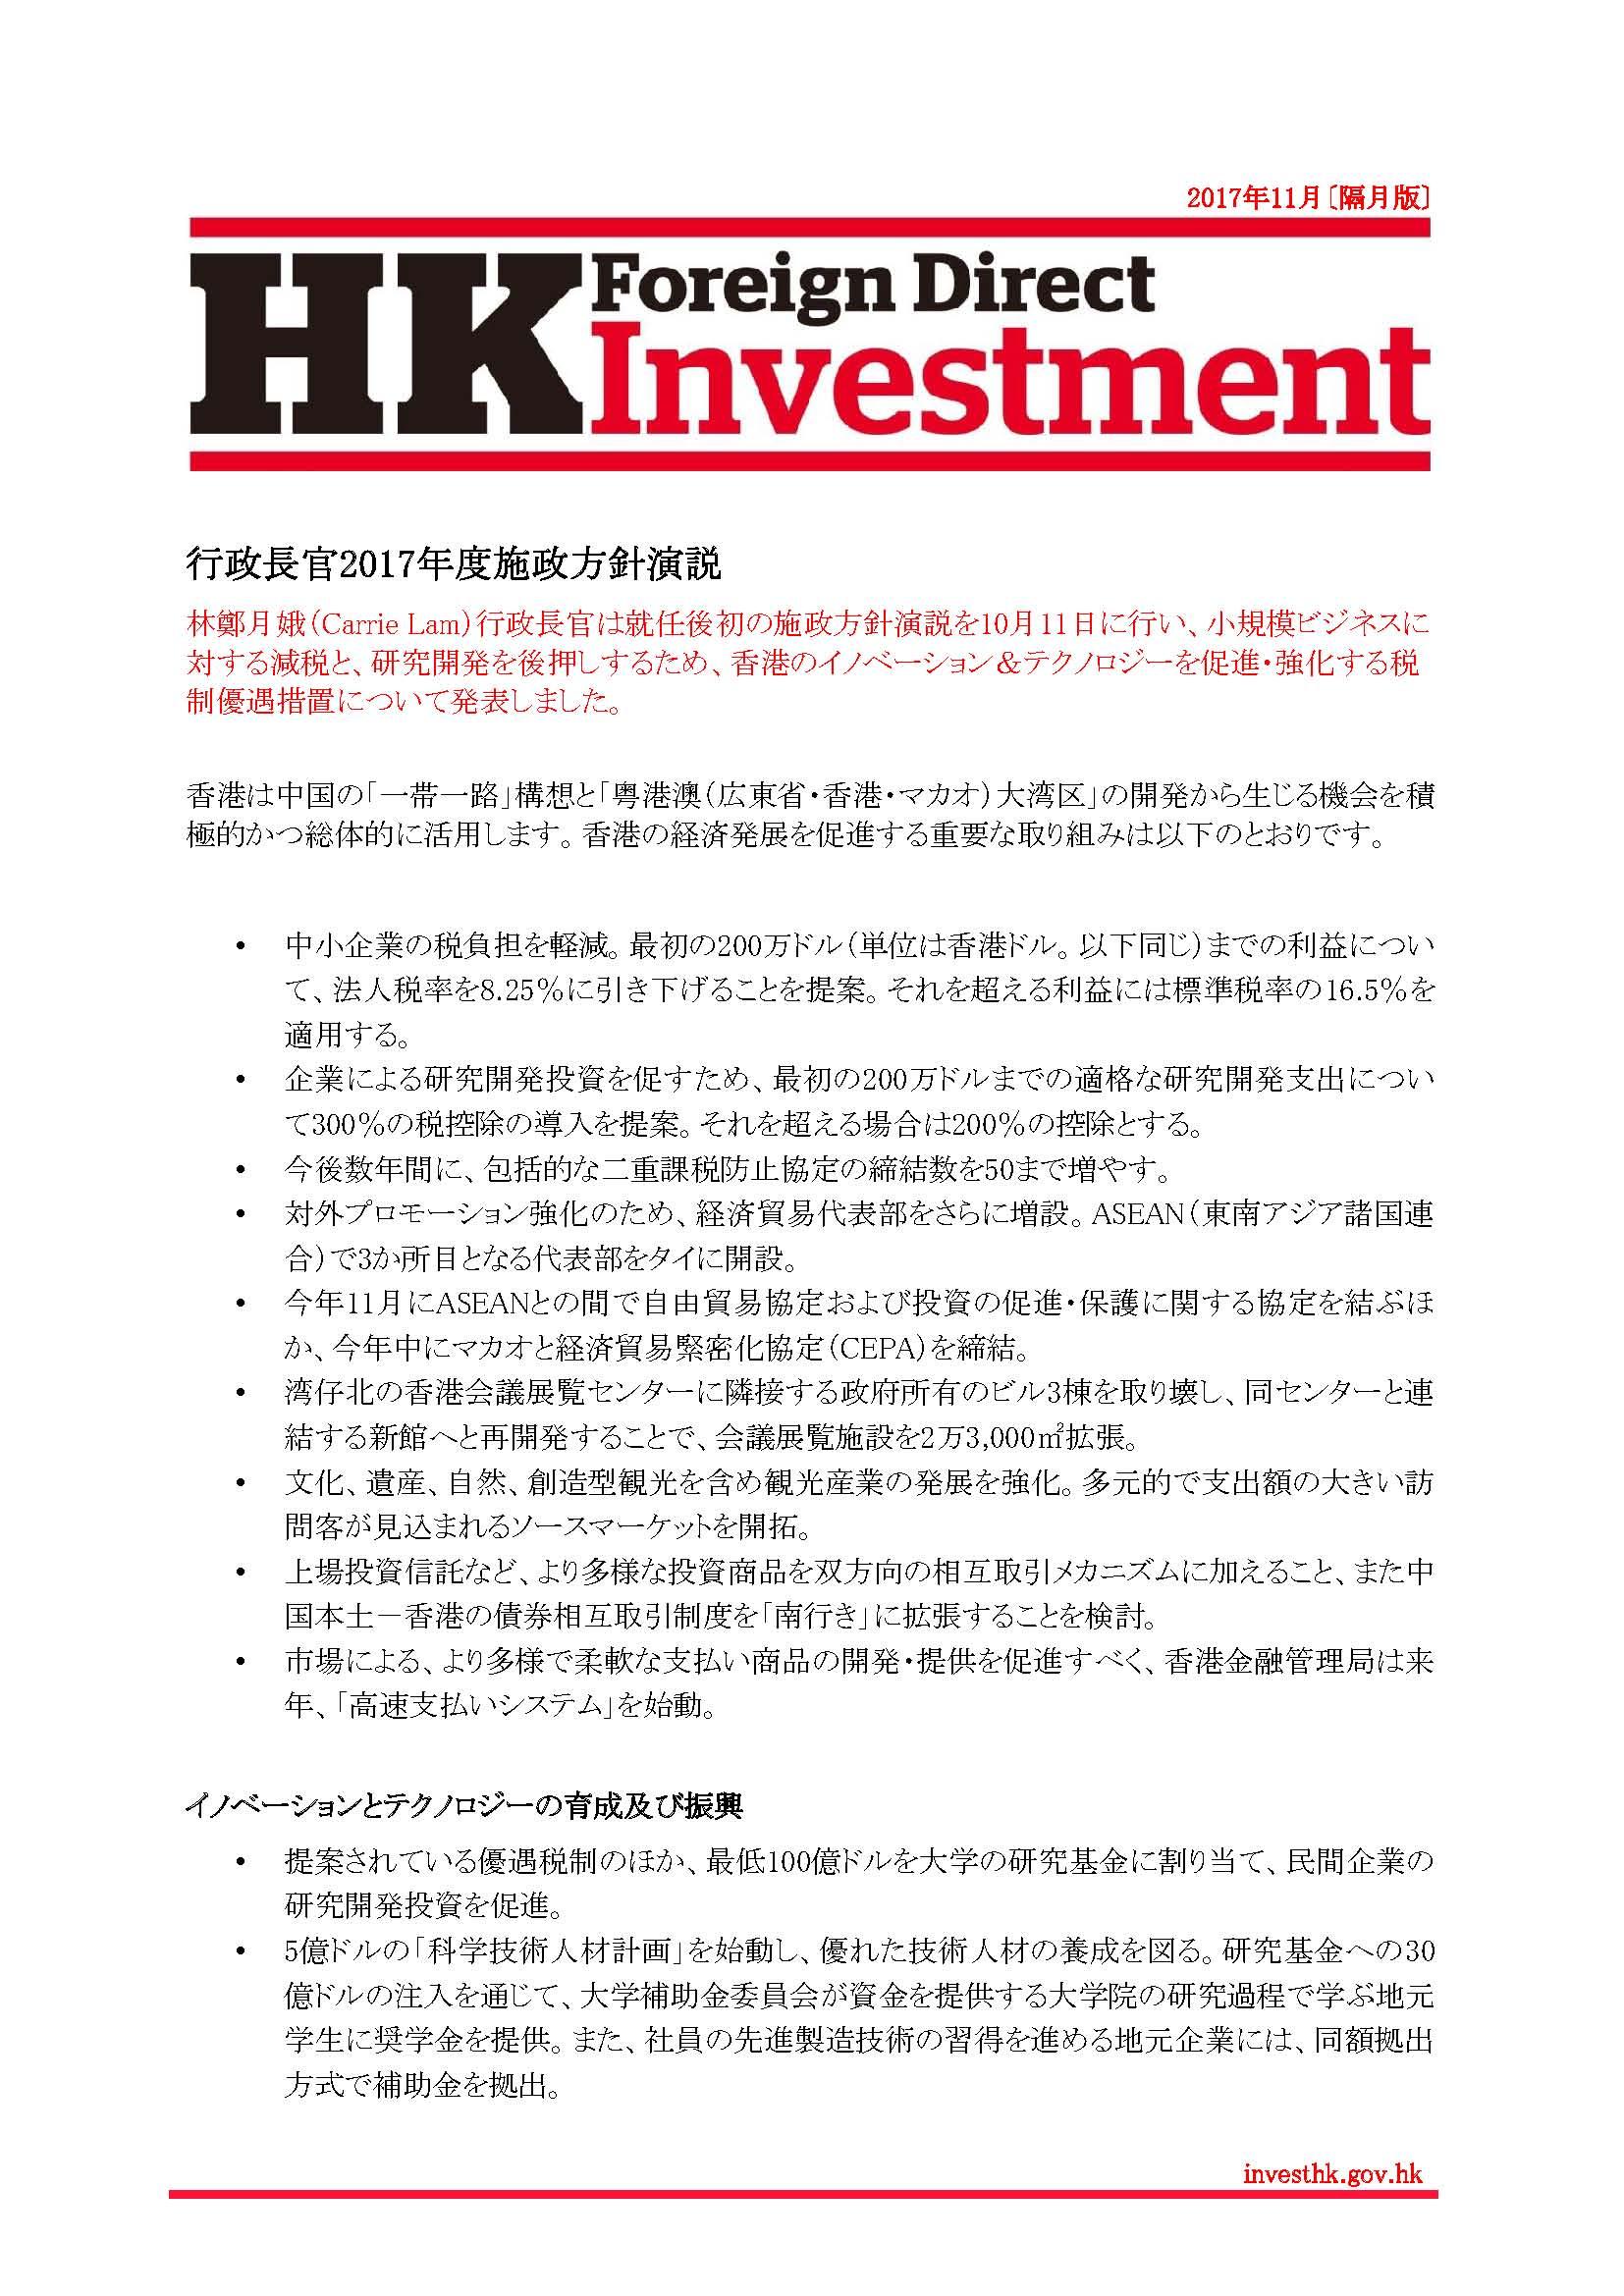 IHK_News-Nov17_Jap_cover